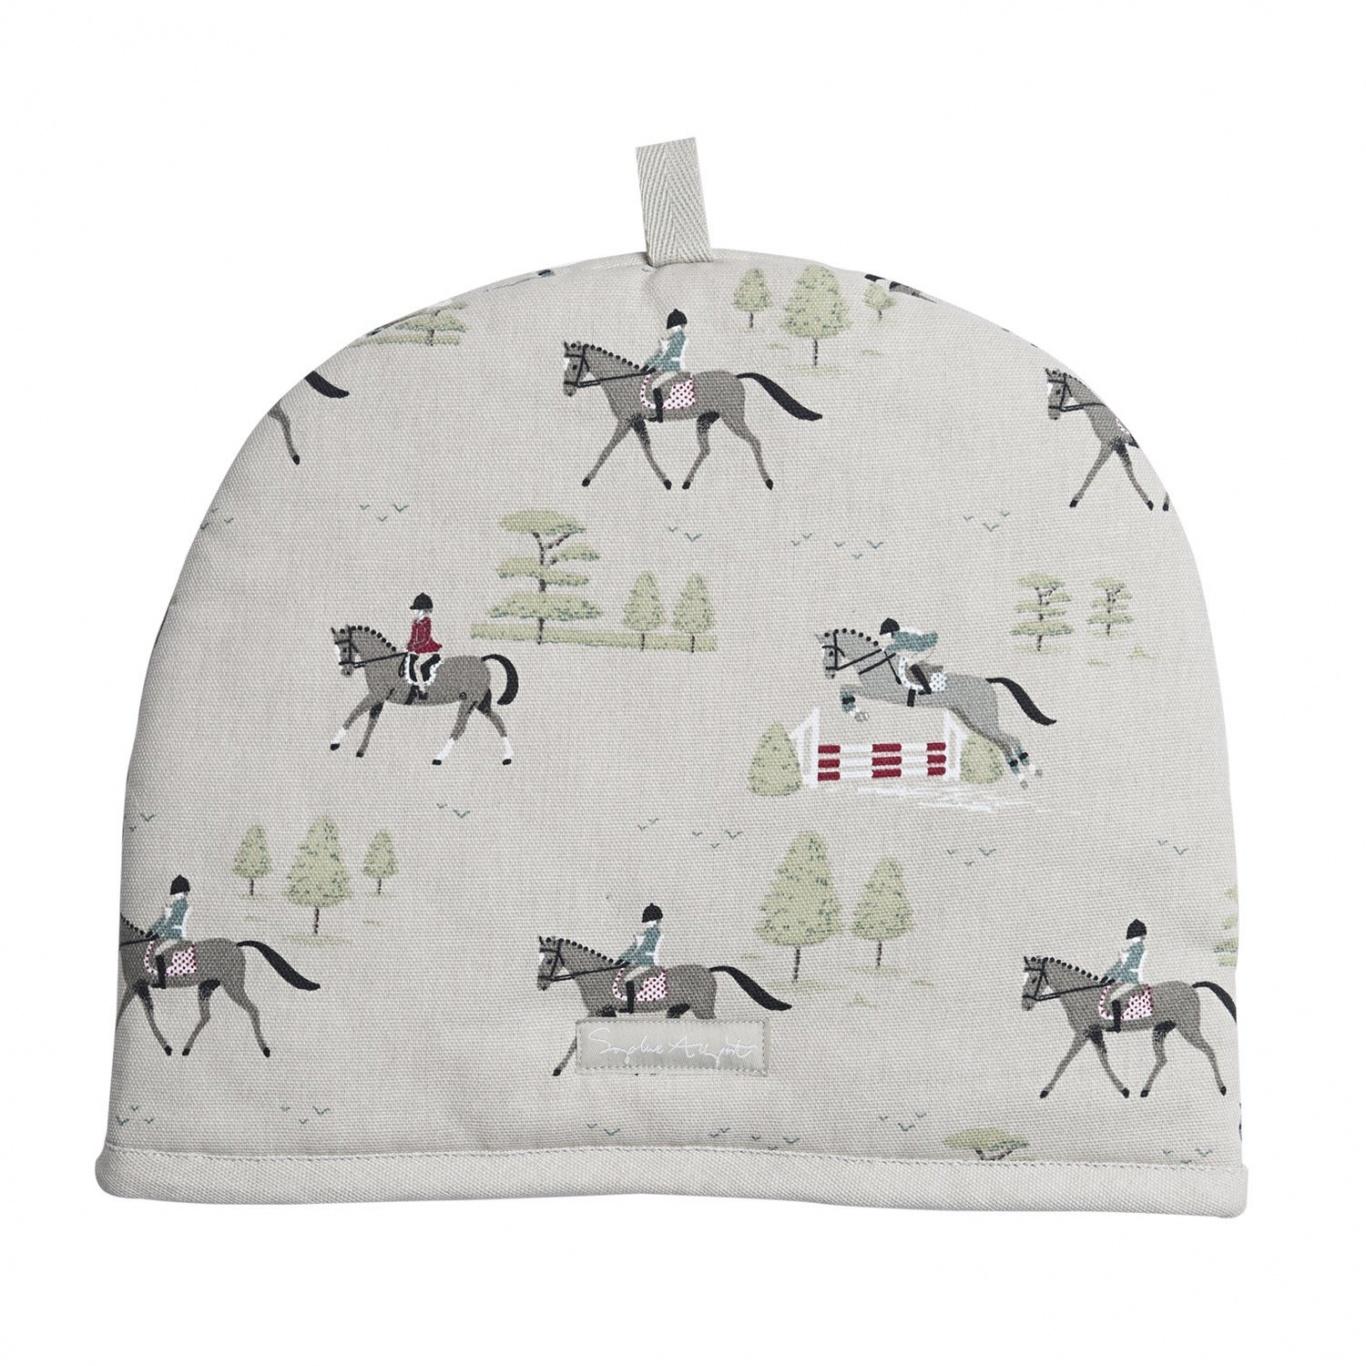 Image of Sophie Allport Horses Tea Cosy